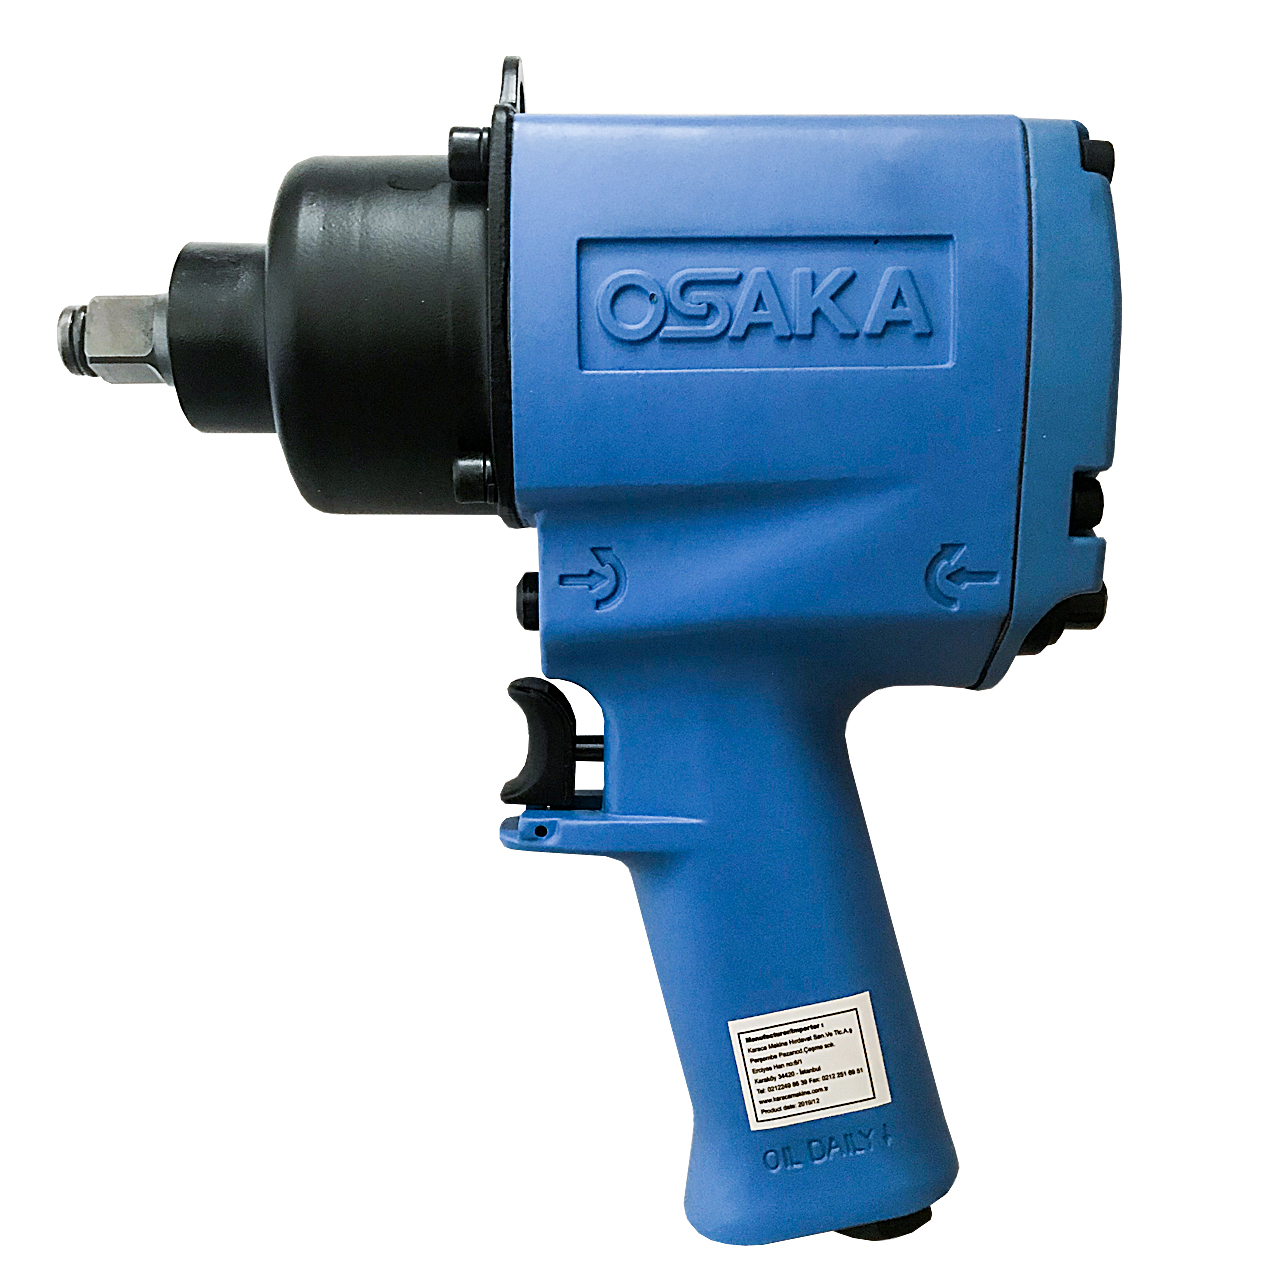 آچار بکس بادی اوساکا کد OPT517ODK